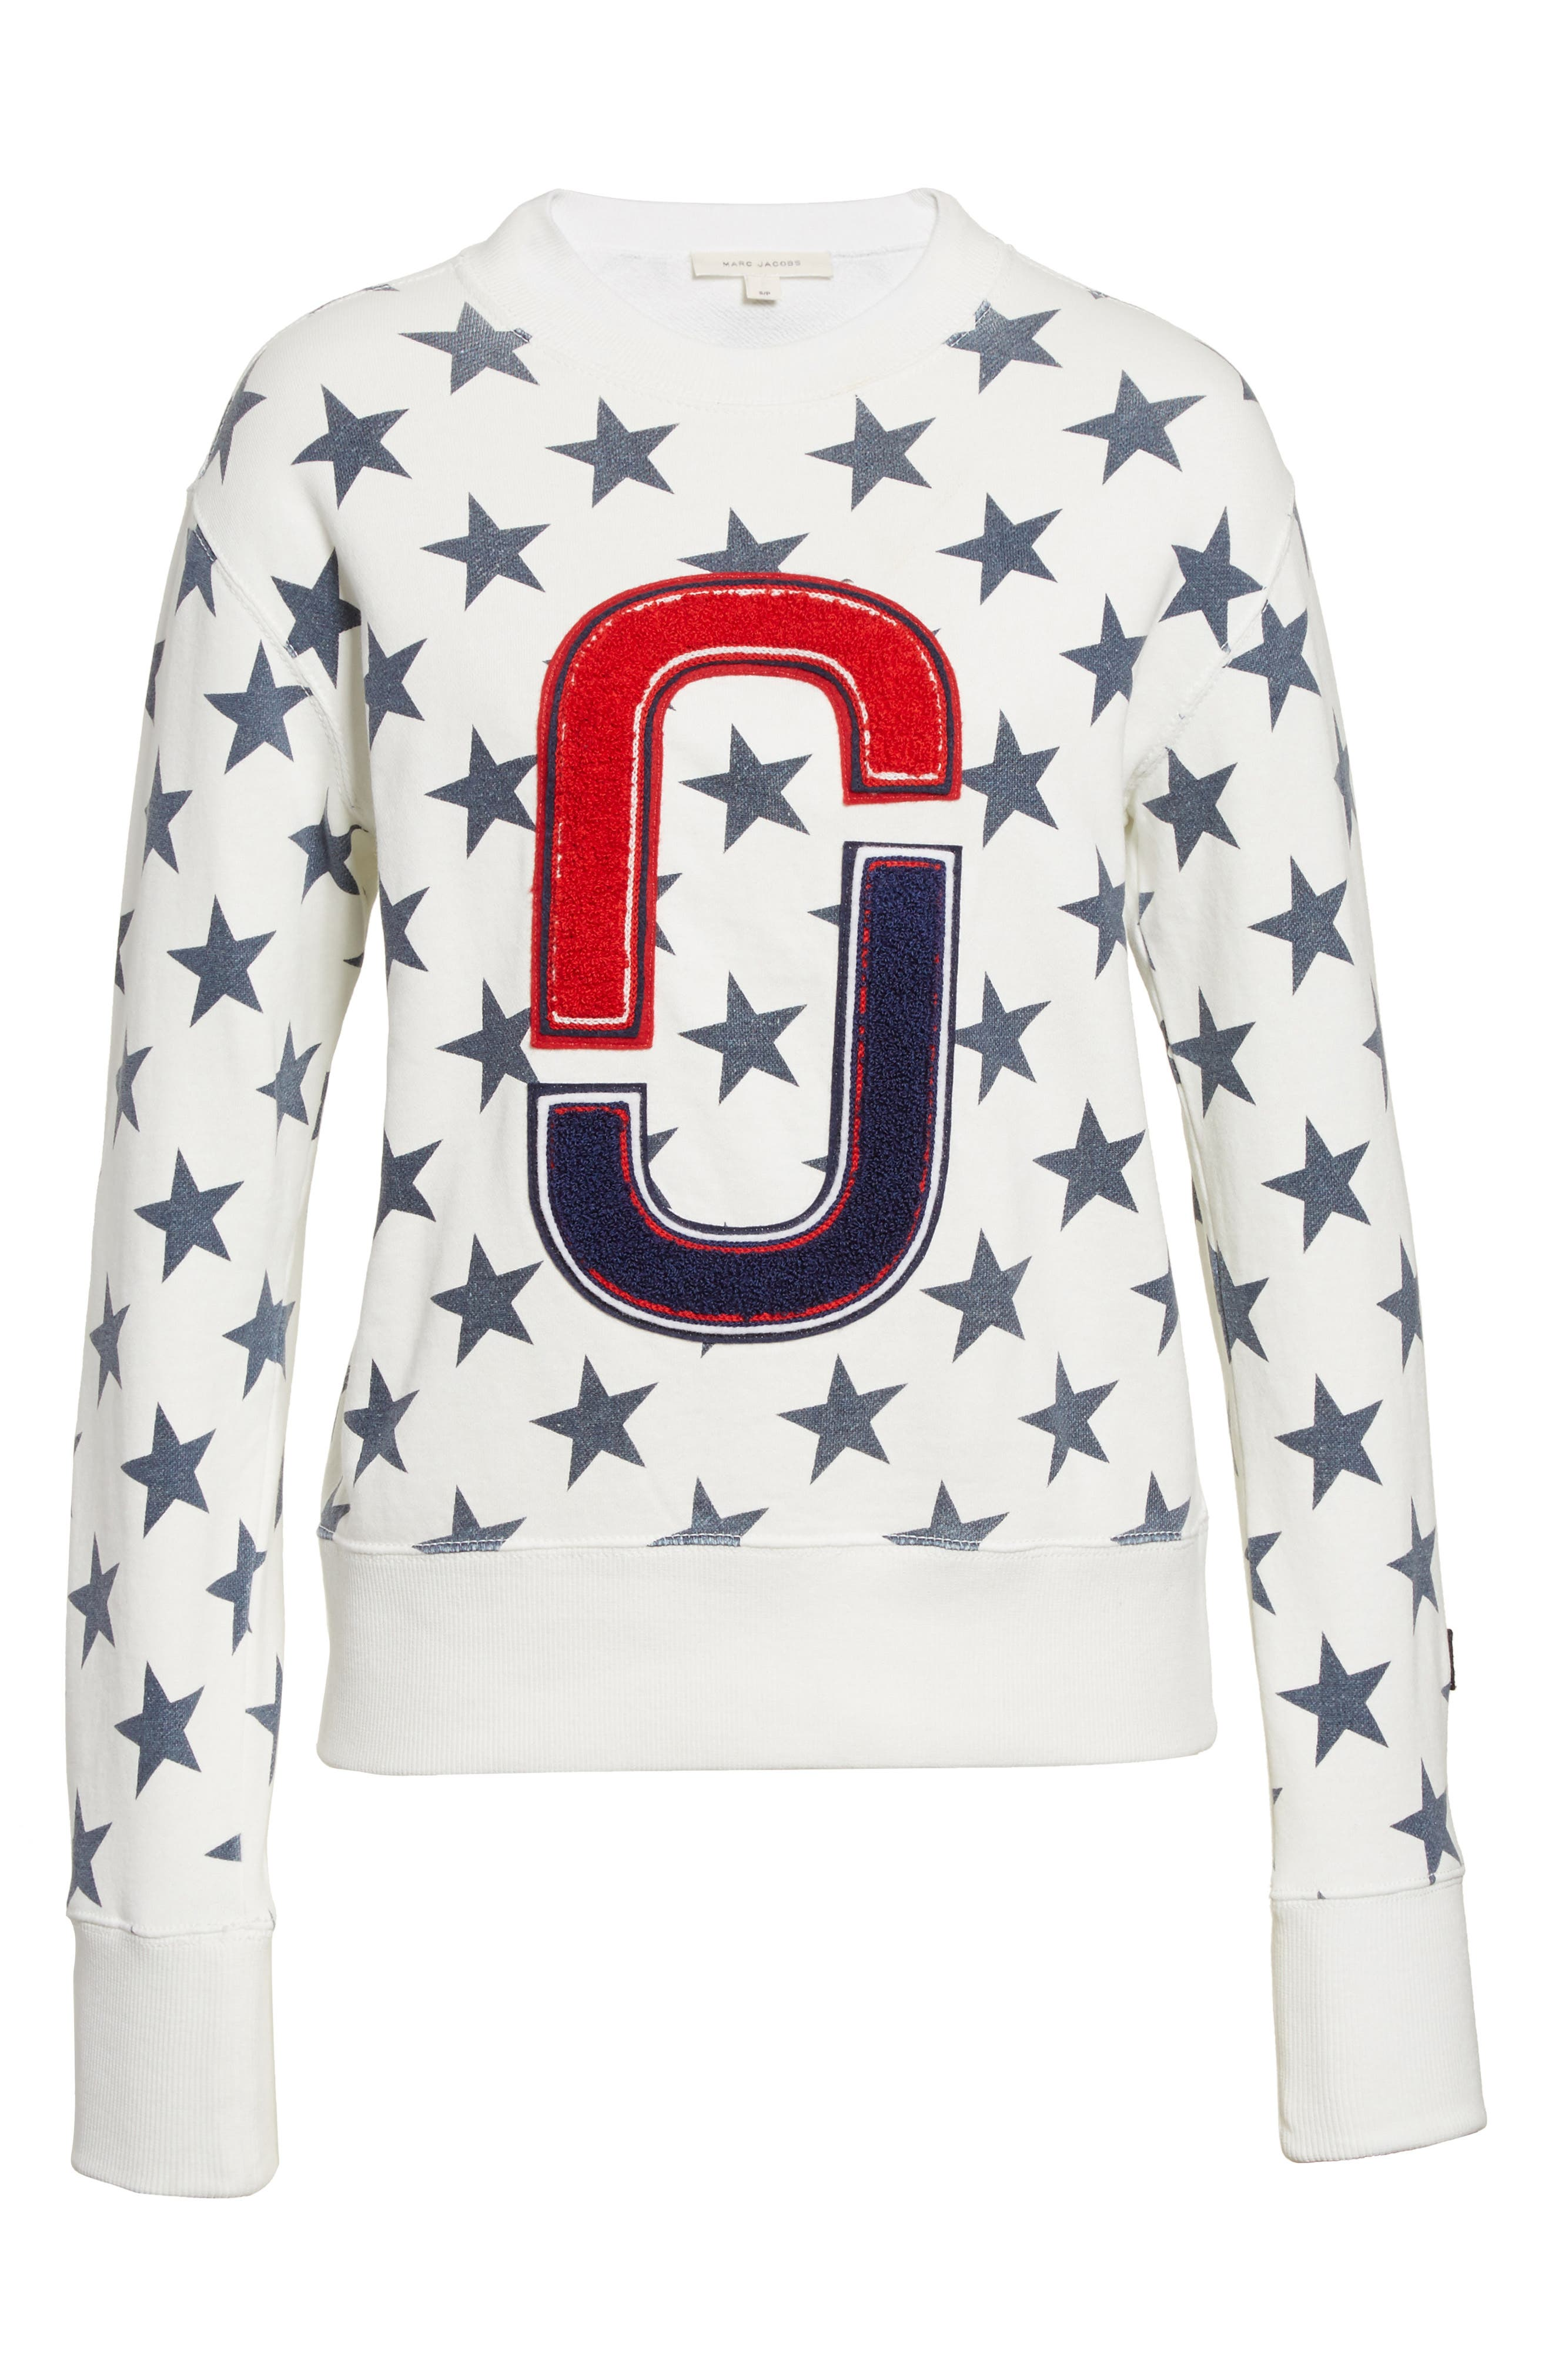 '90s Star Print Sweatshirt,                             Alternate thumbnail 4, color,                             Ivory Multi